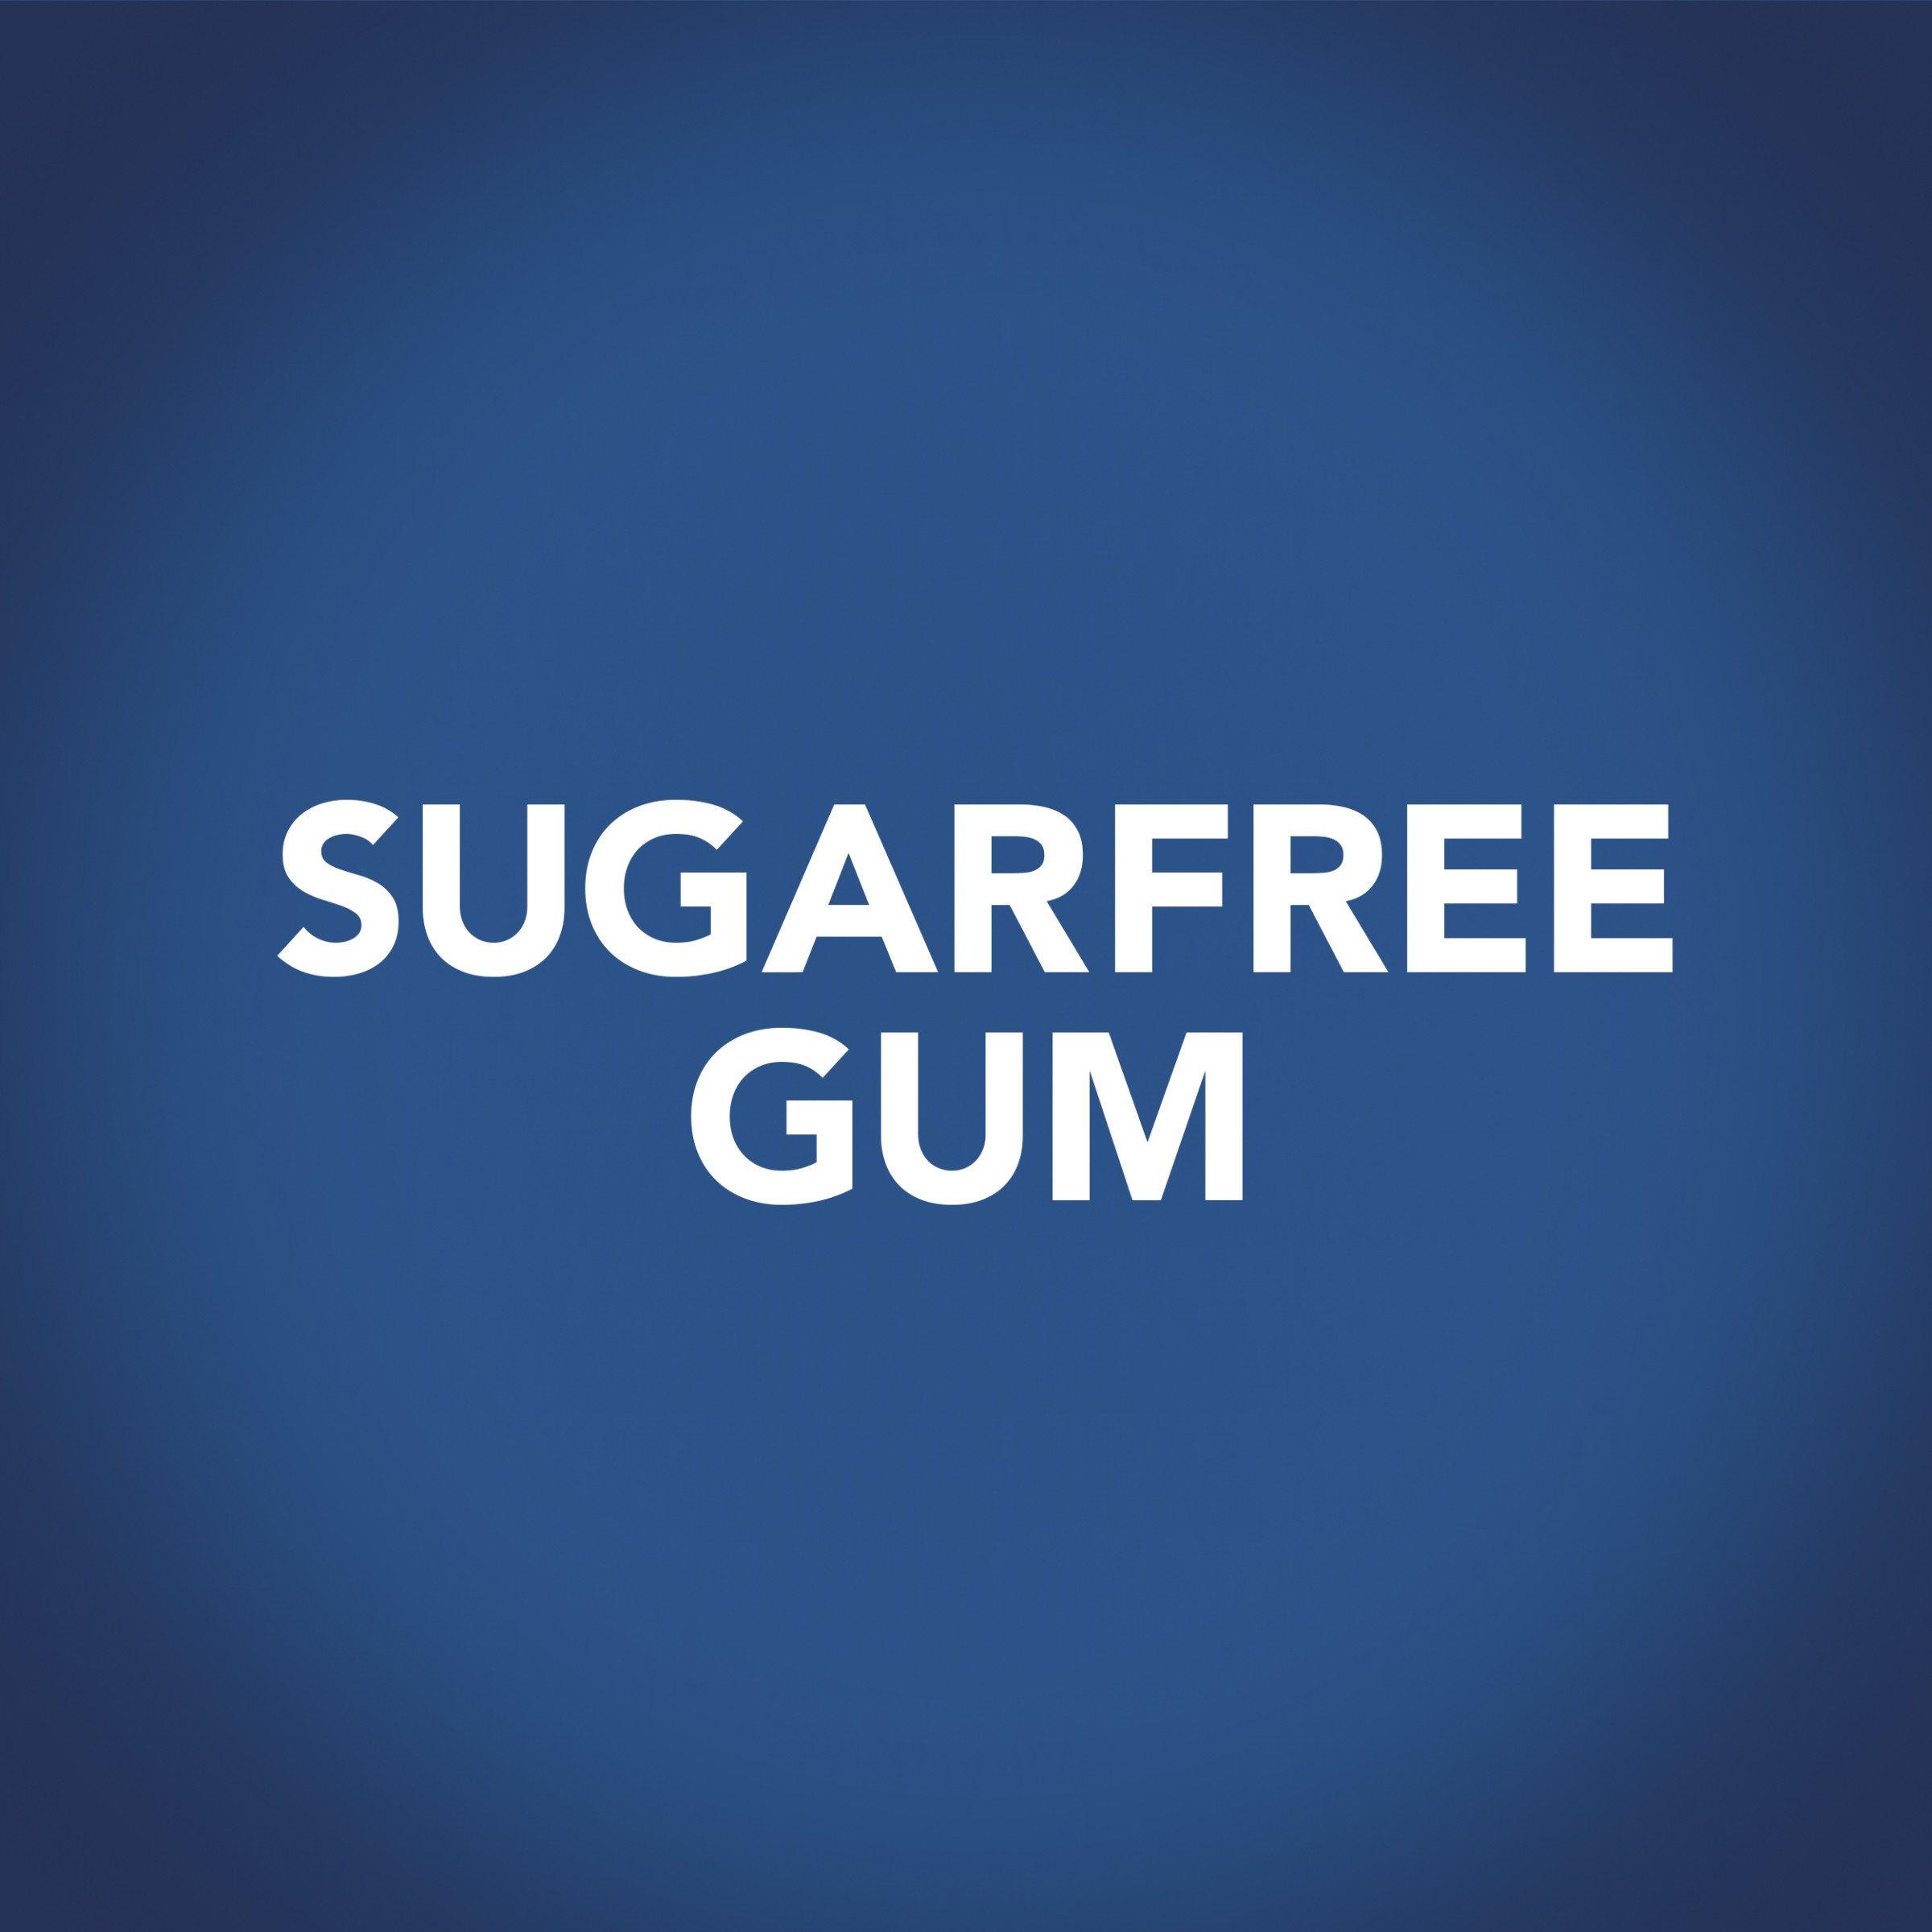 Orbit Sweet Mint Sugarfree Gum, 8 Count (Pack of 6) by Orbit Gum (Image #5)